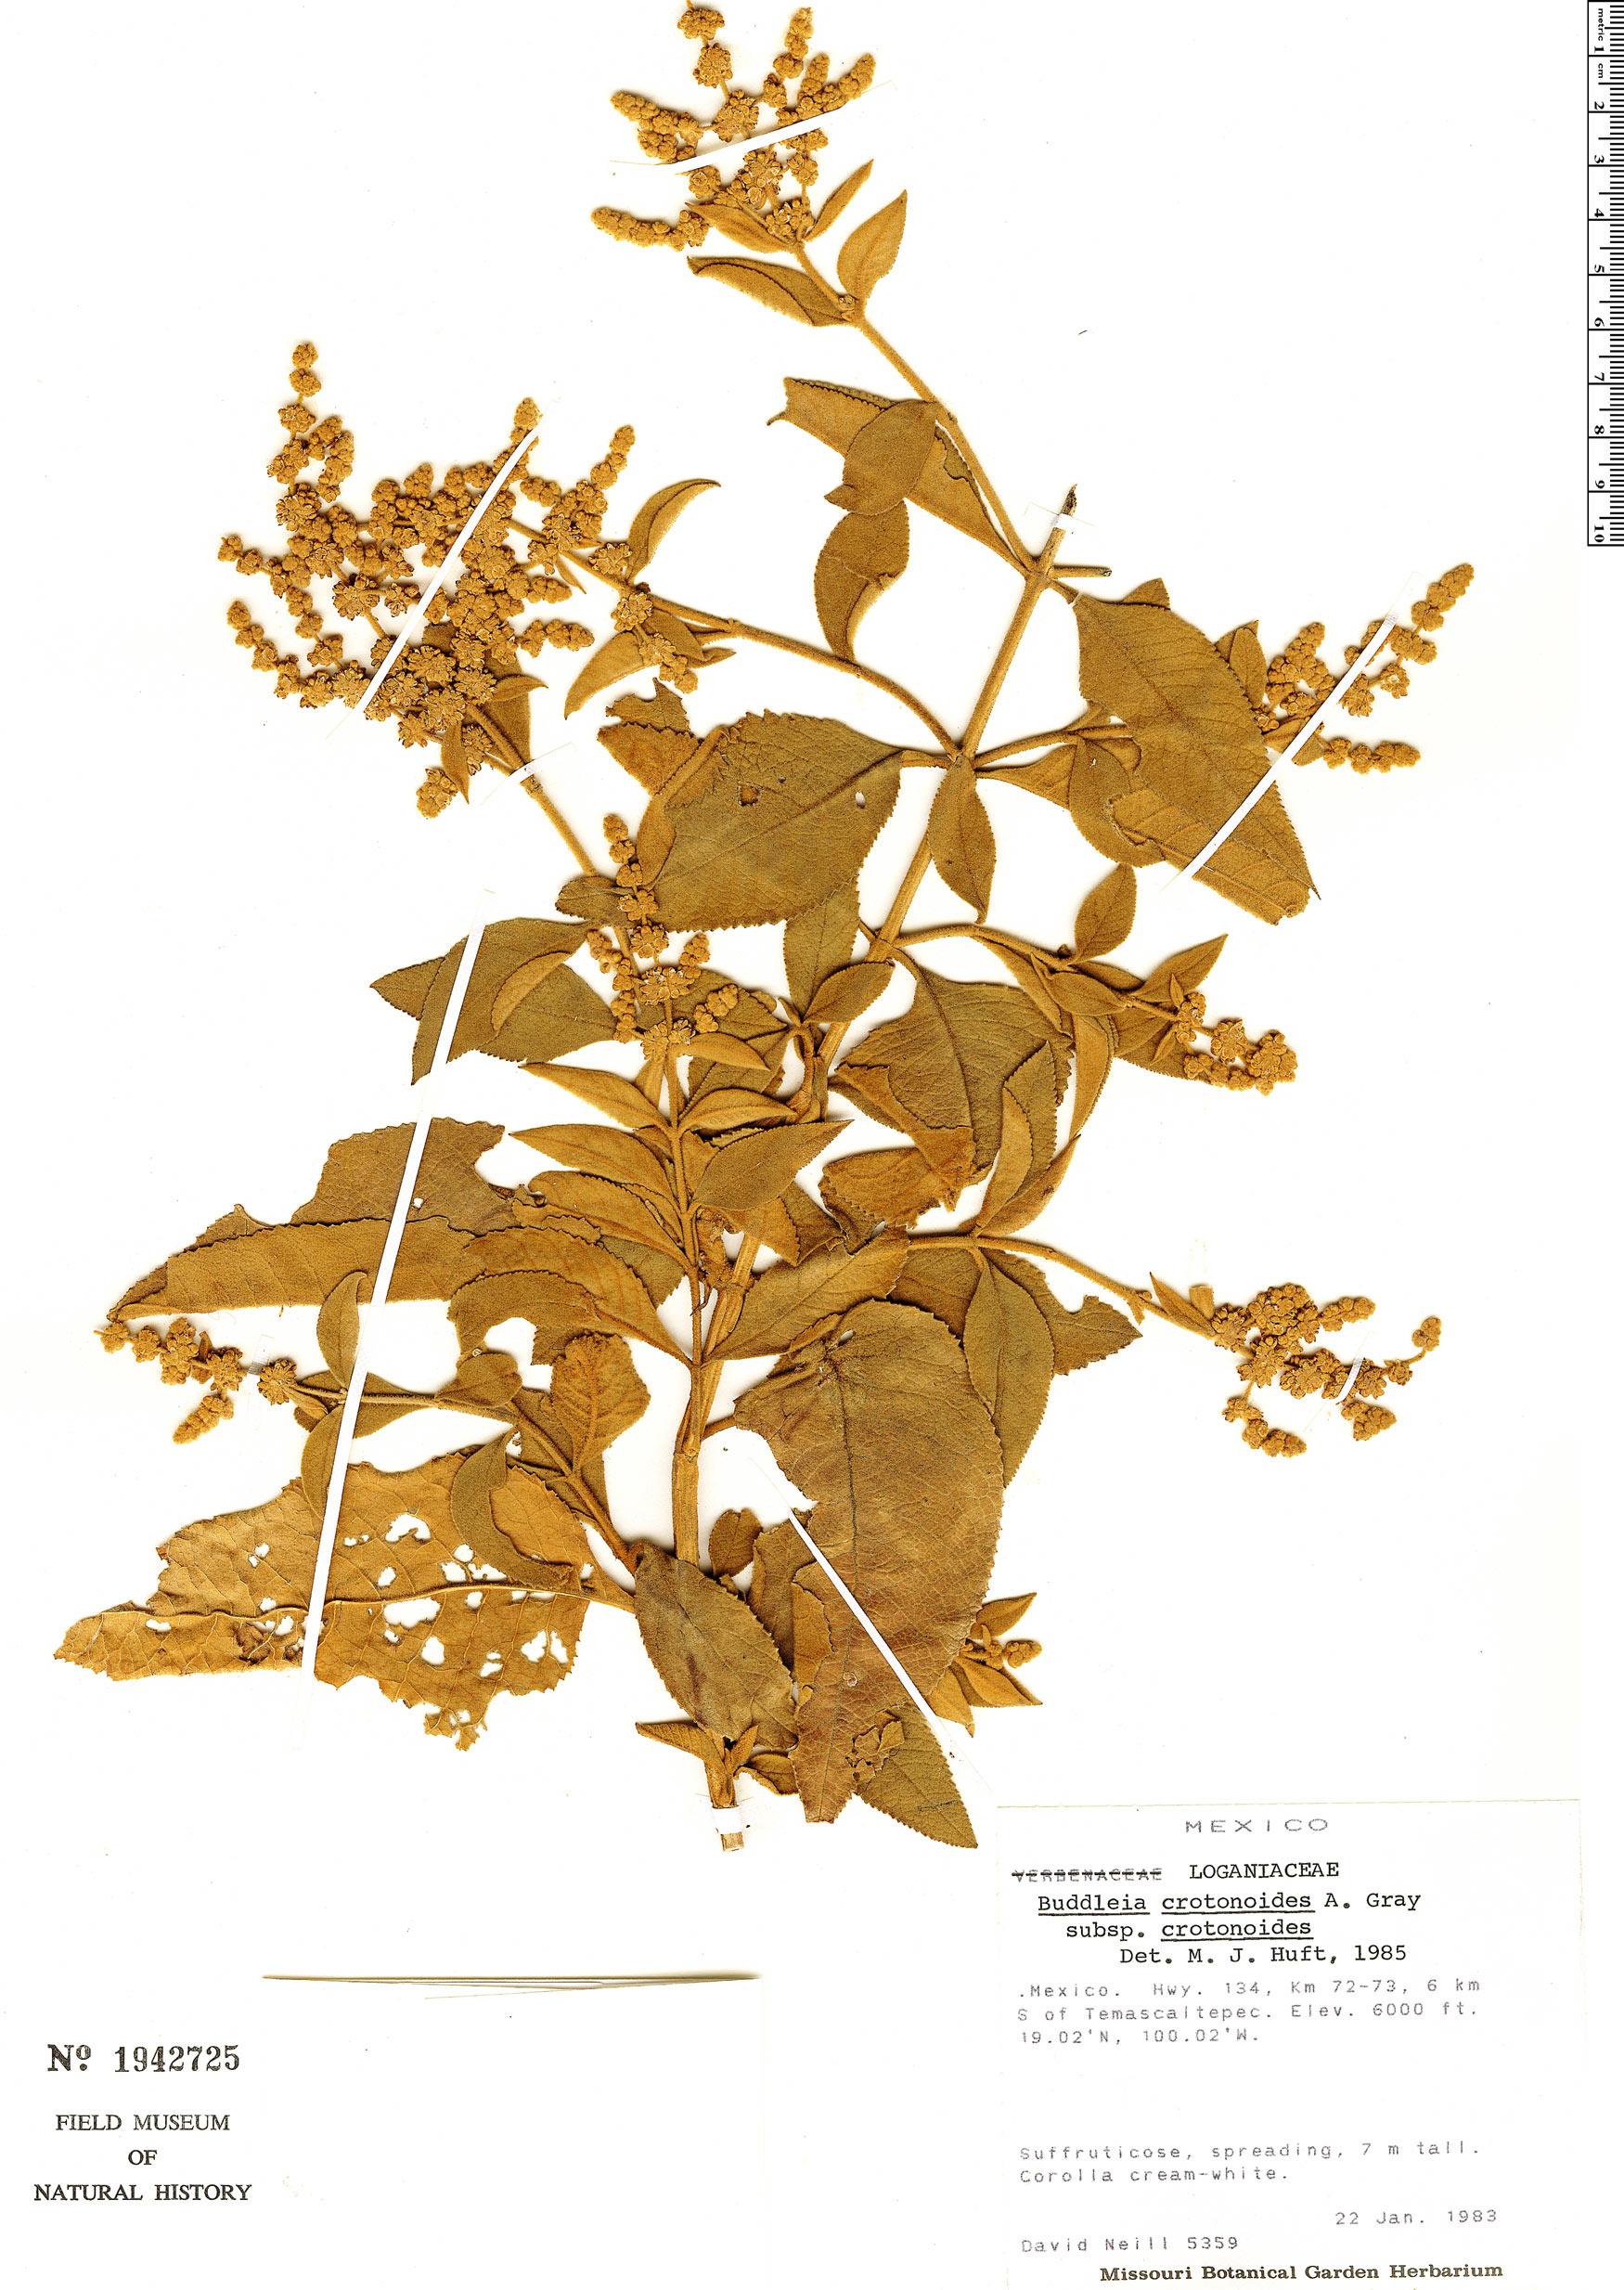 Specimen: Buddleja crotonoides